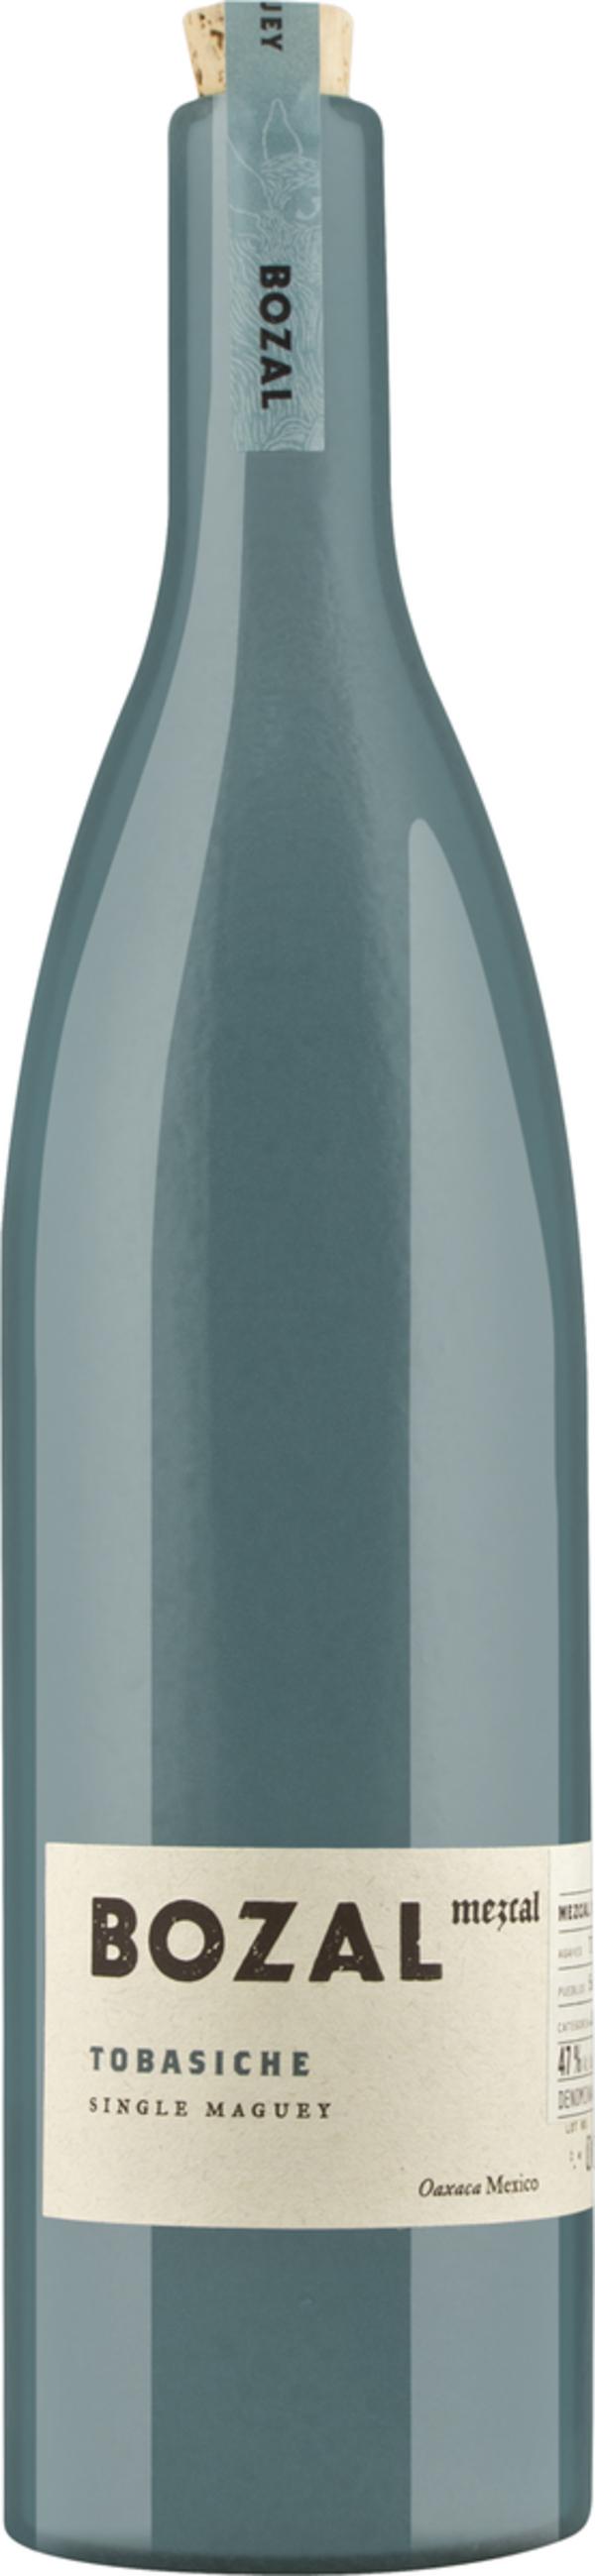 Bozal Tobasiche Mezcal Single Maguey   - Wein - 3 Badge, Mexiko, trocken, 0,7l